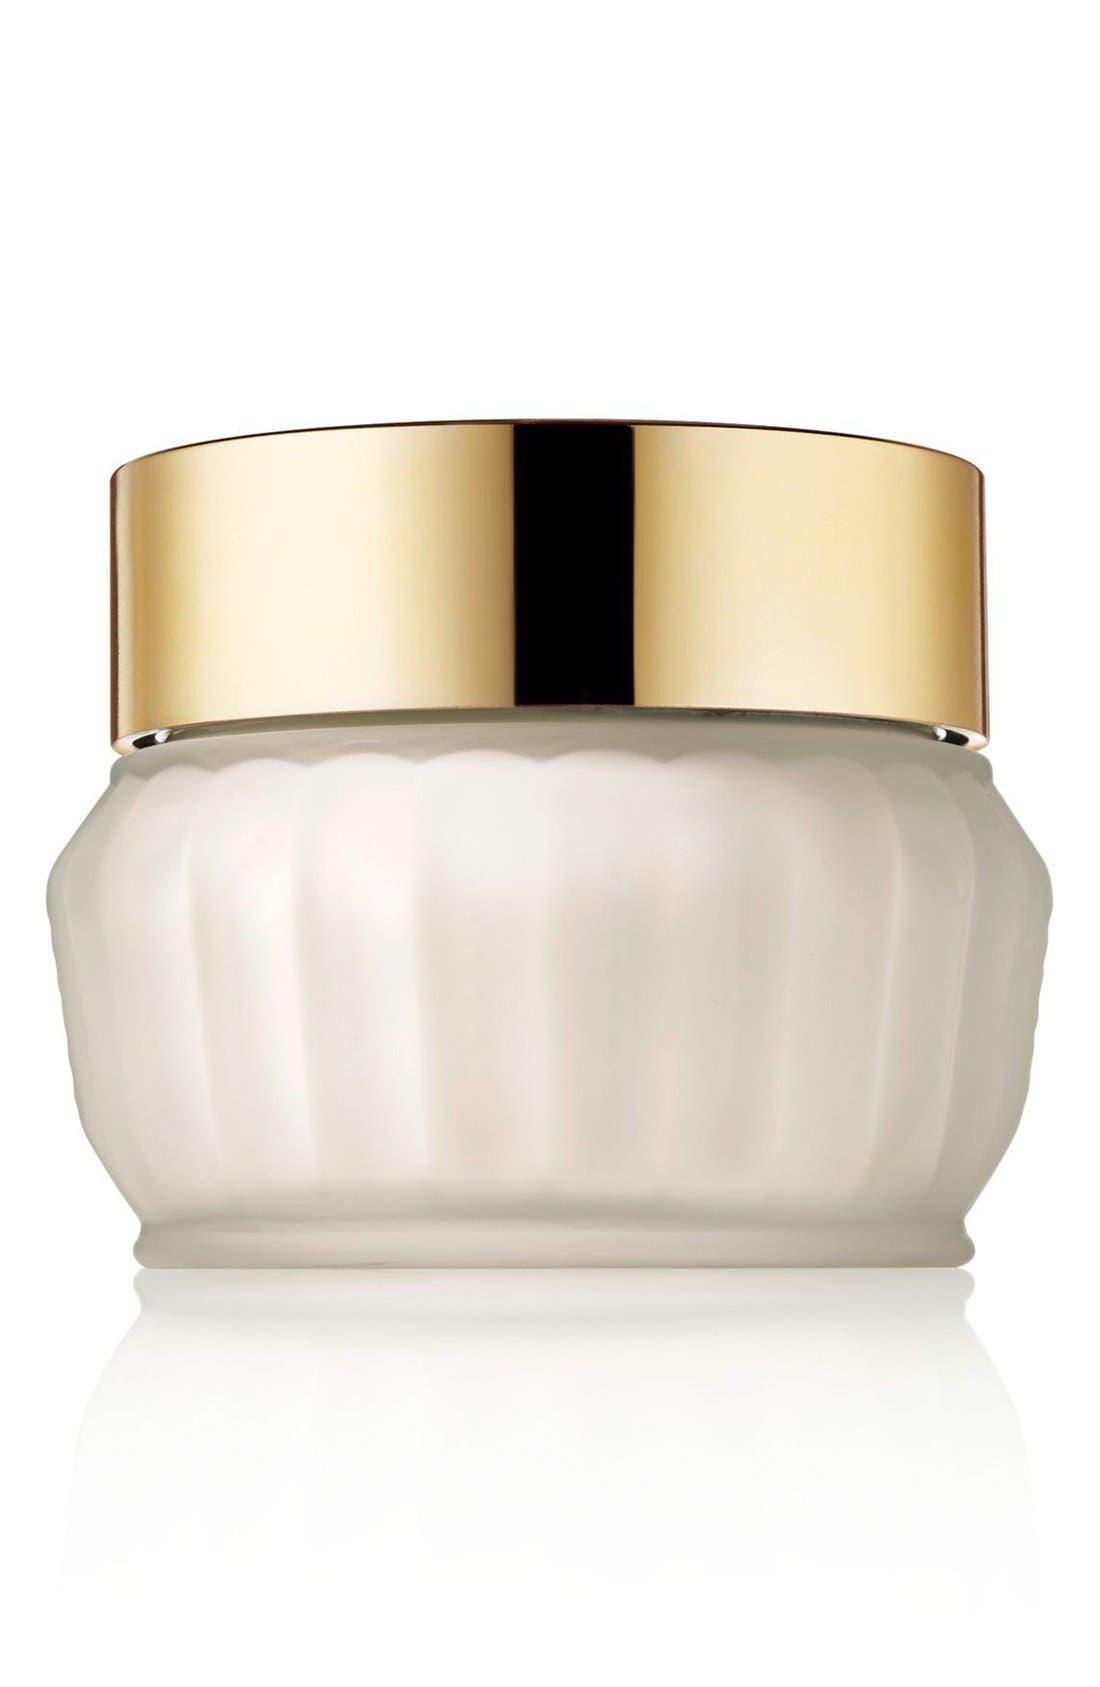 Estée Lauder Youth-Dew Perfumed Body Creme